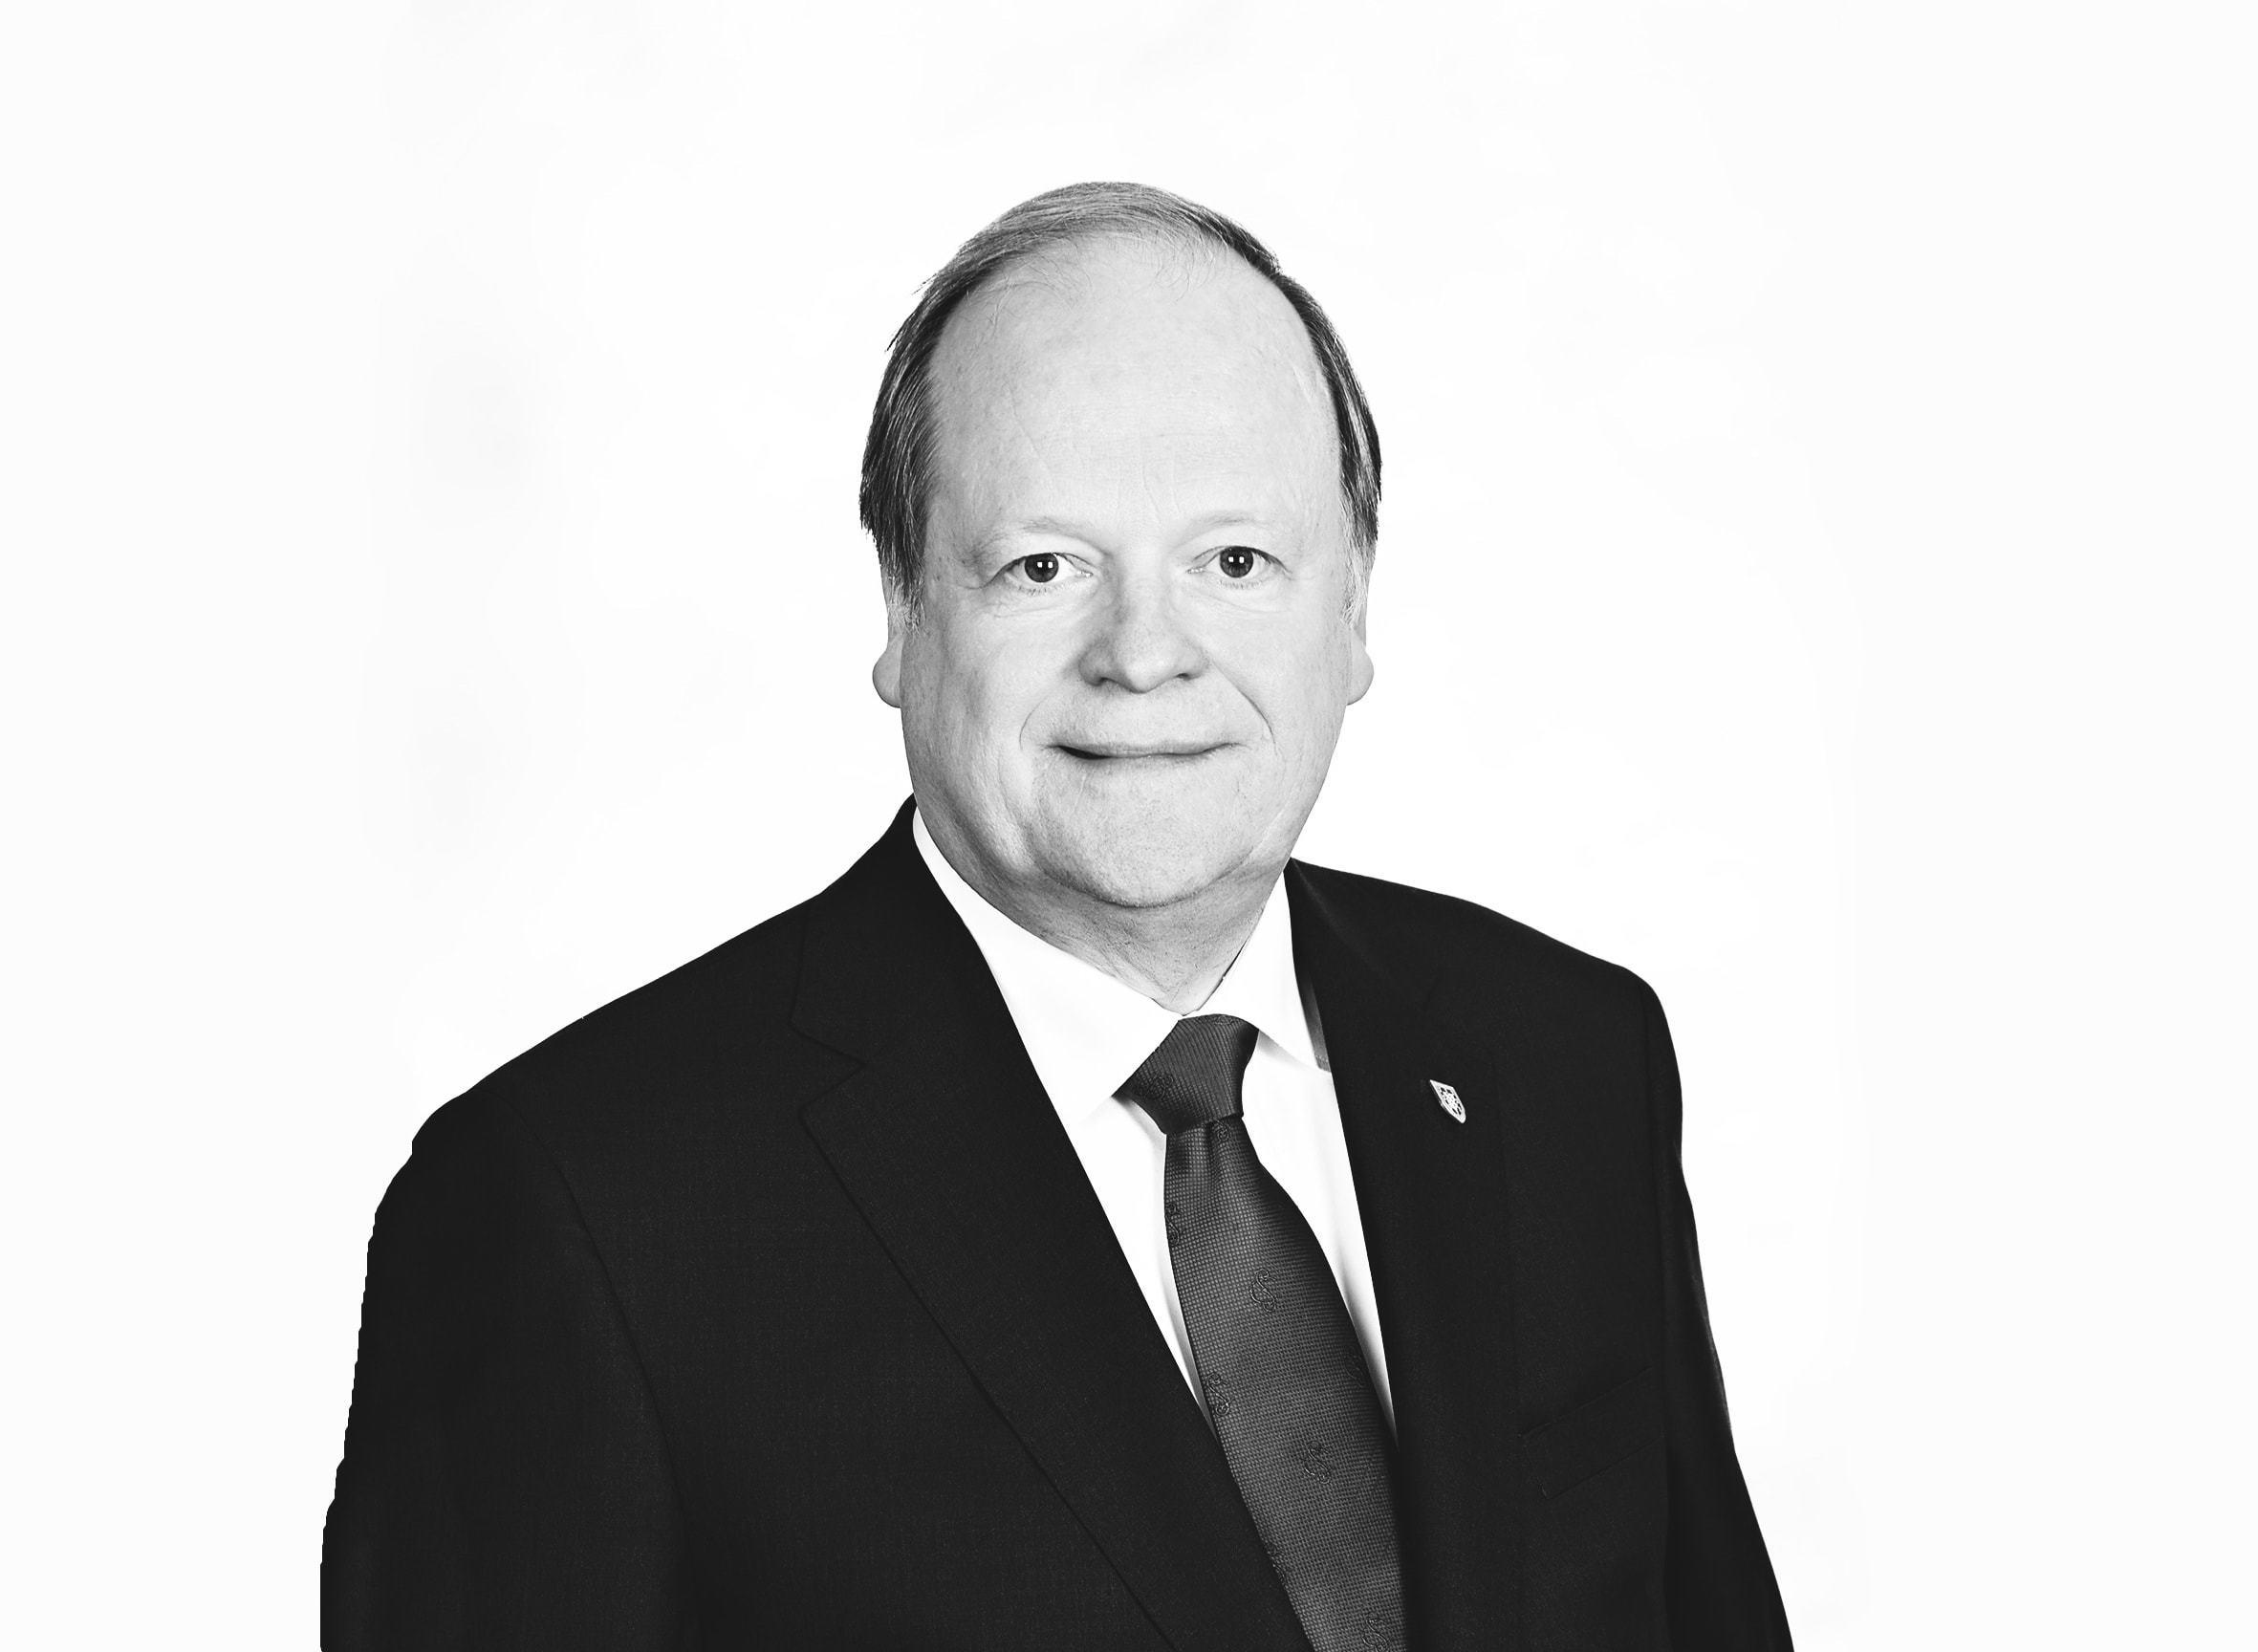 The Honourable Thomas Albert Cromwell (CNW Group/Borden Ladner Gervais LLP)